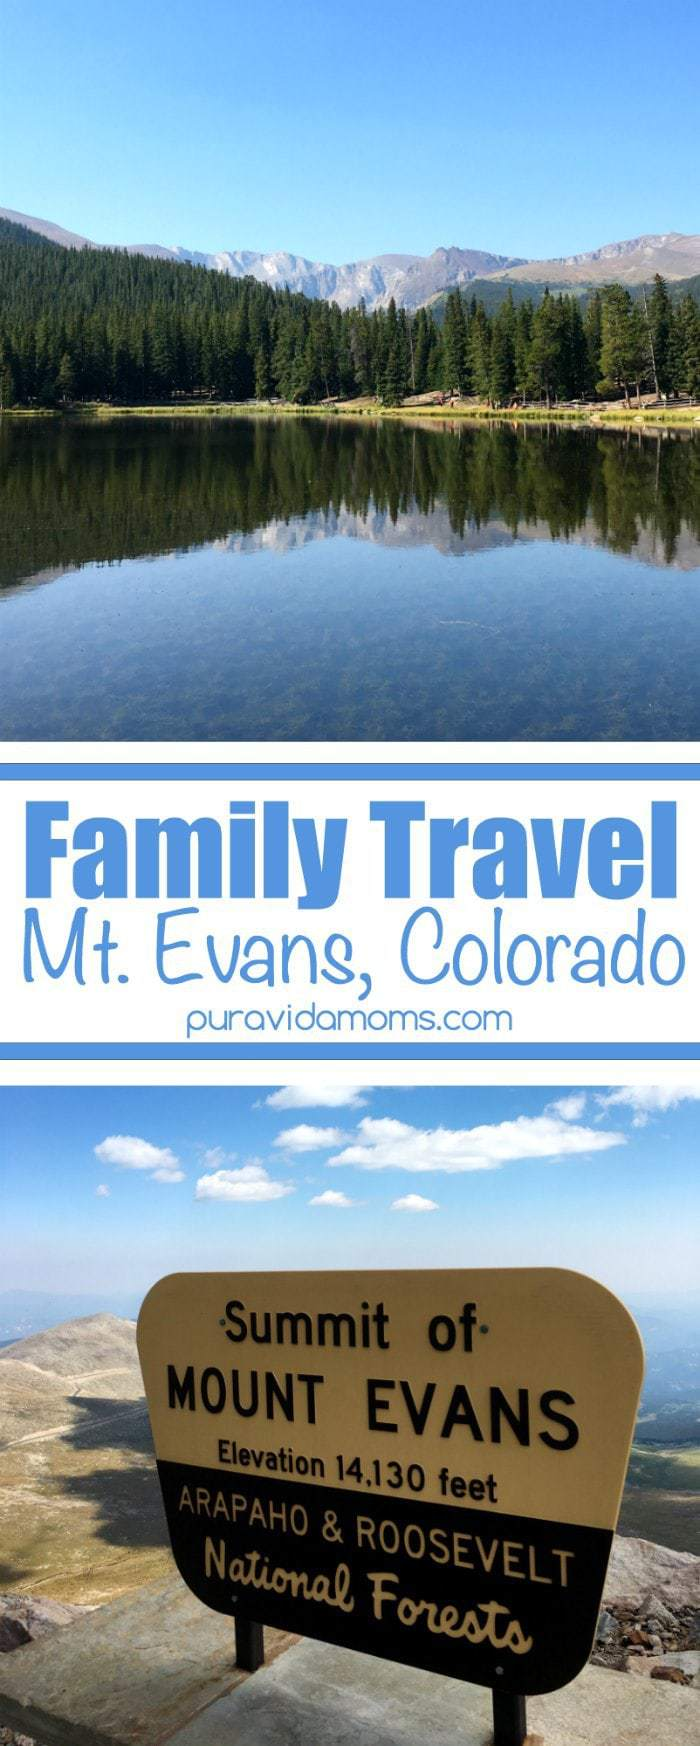 Family Travel to Mount Evans Colorado